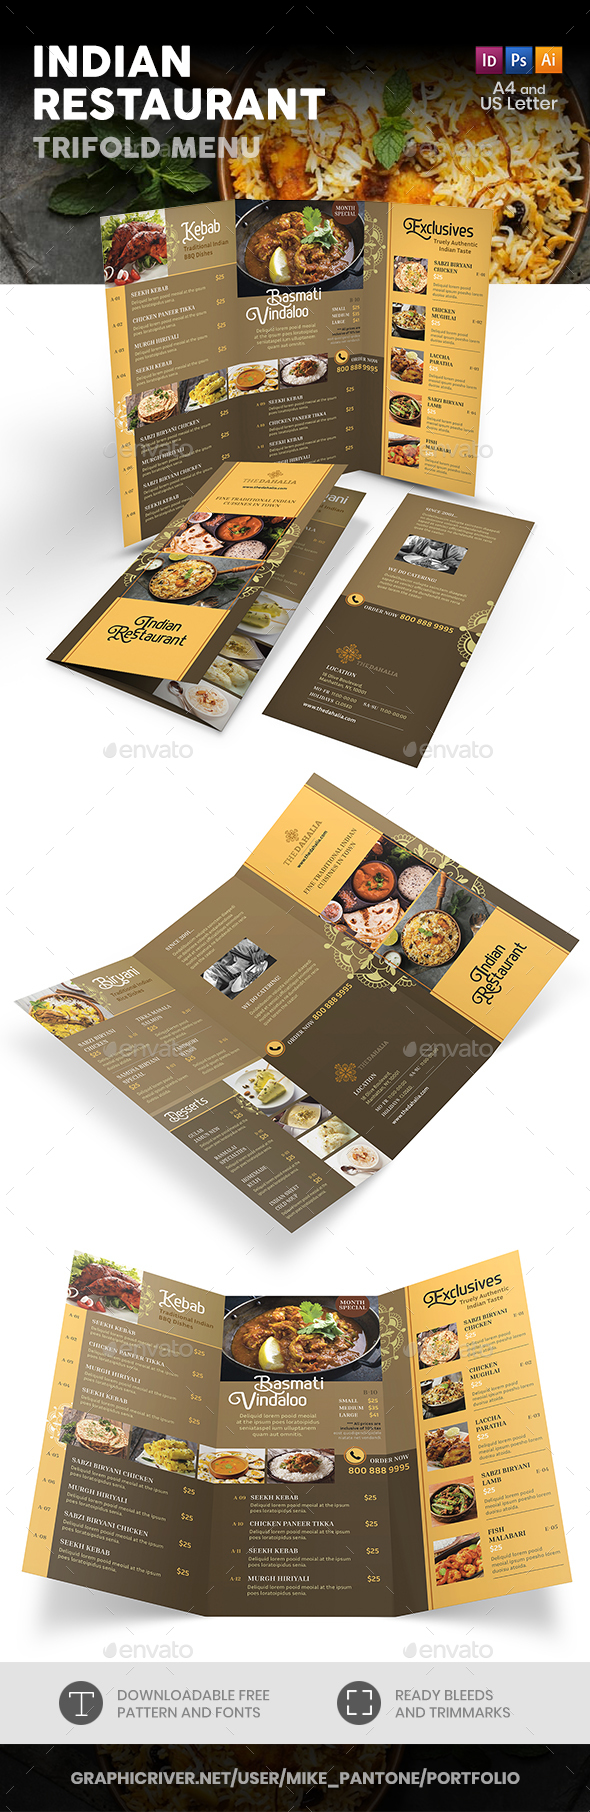 Indian Restaurant Trifold Menu 2 - Food Menus Print Templates